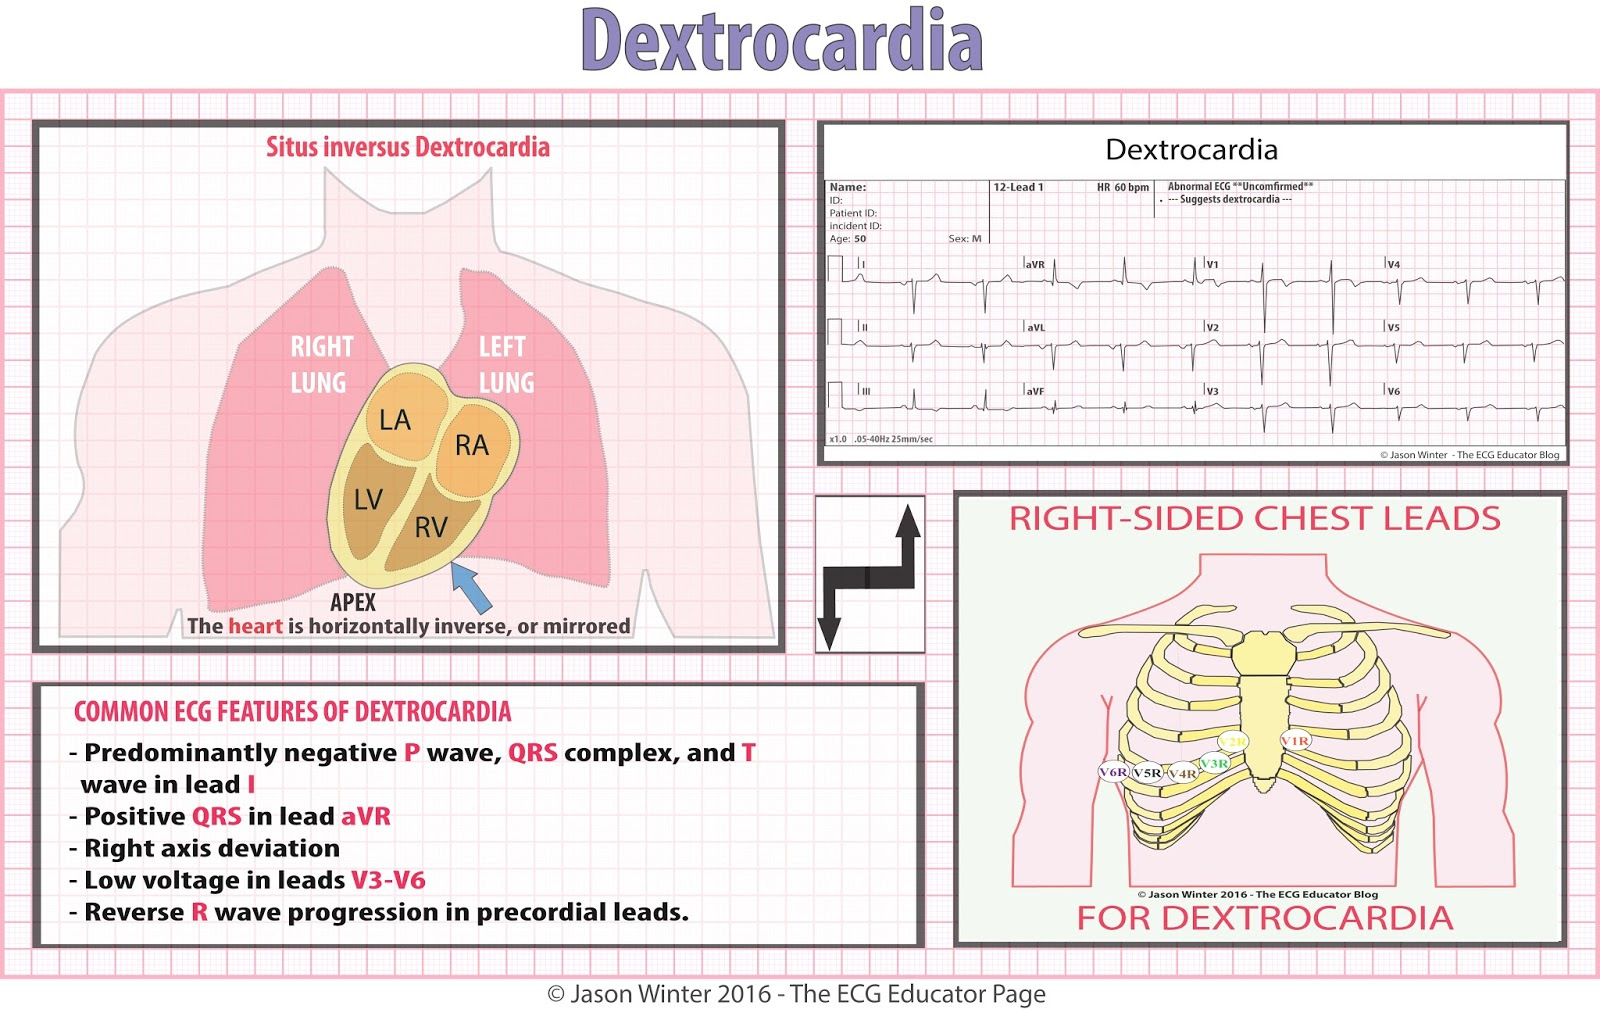 Ecg educator blog dextrocardia ecg study card for dextrocardia pooptronica Images